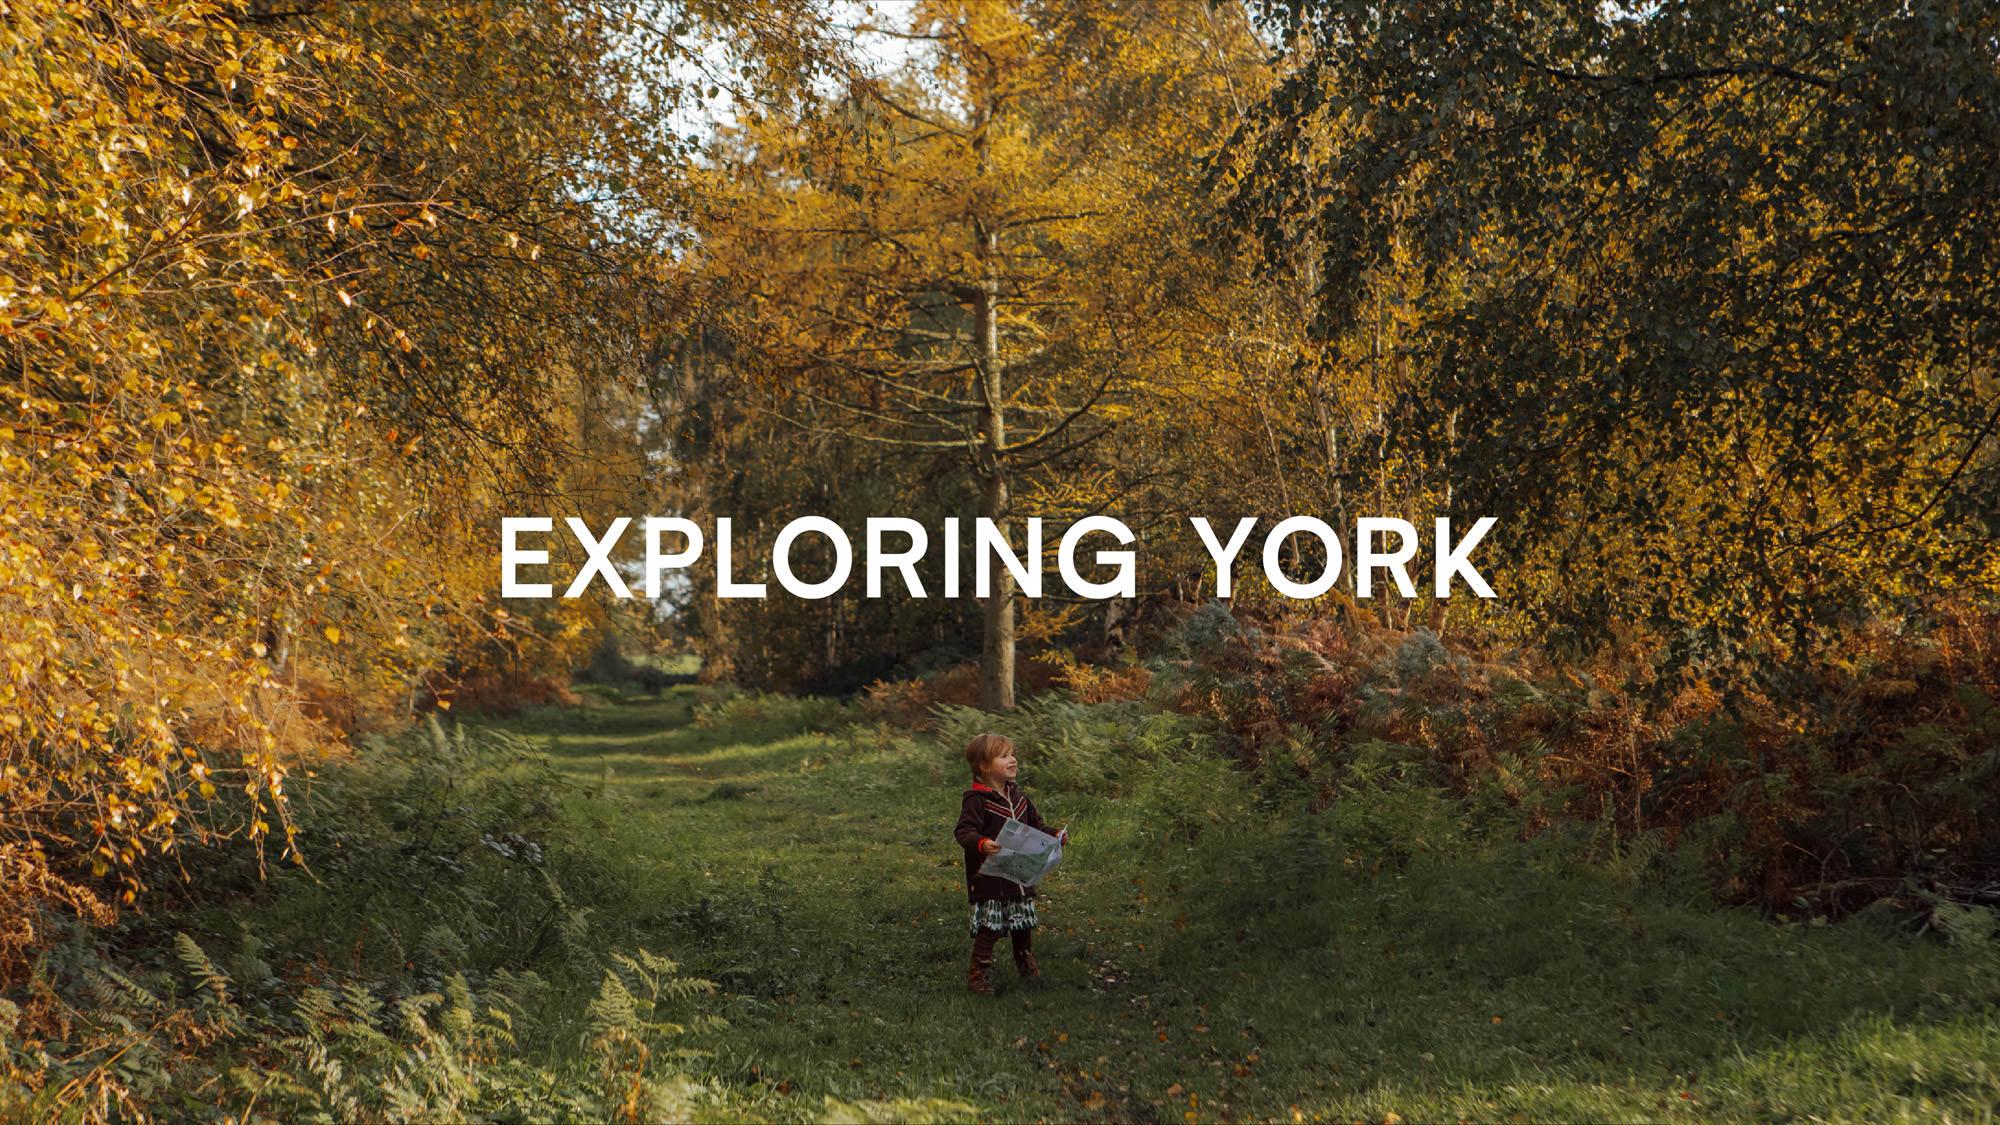 Exploring York logo